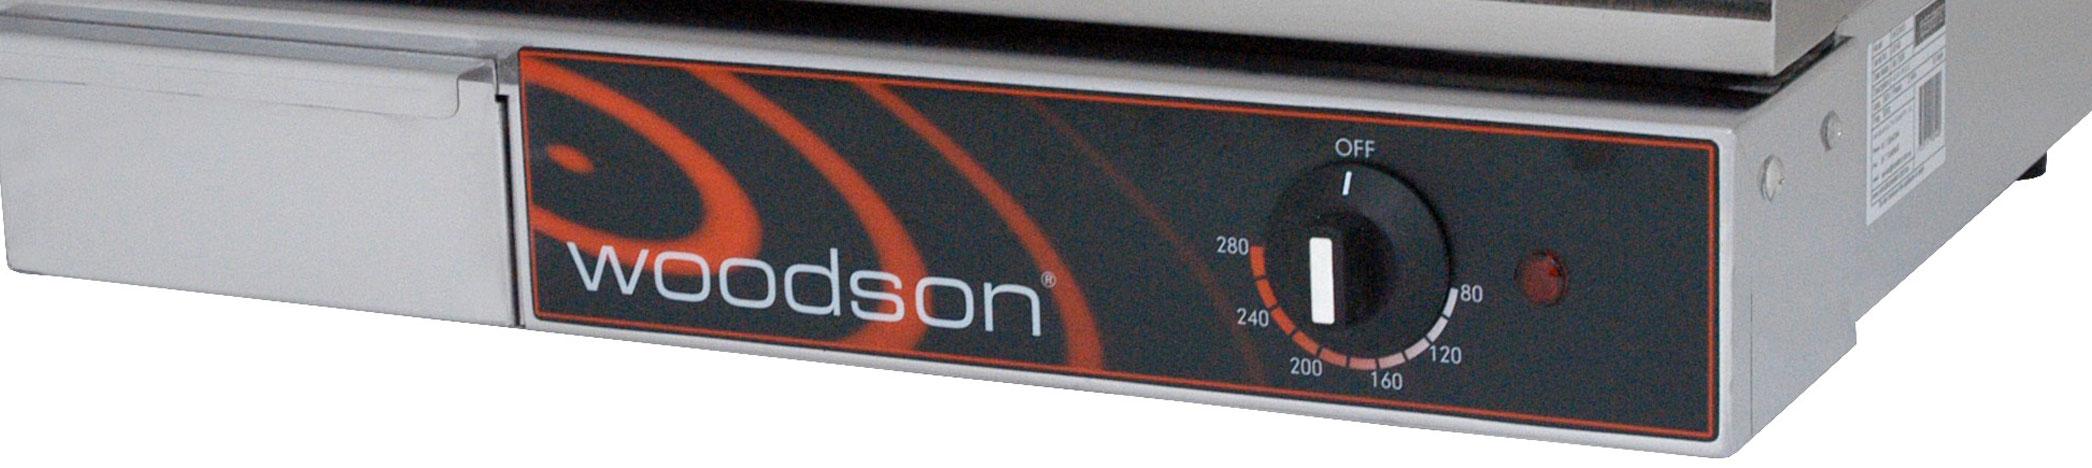 woodson-brand.jpg